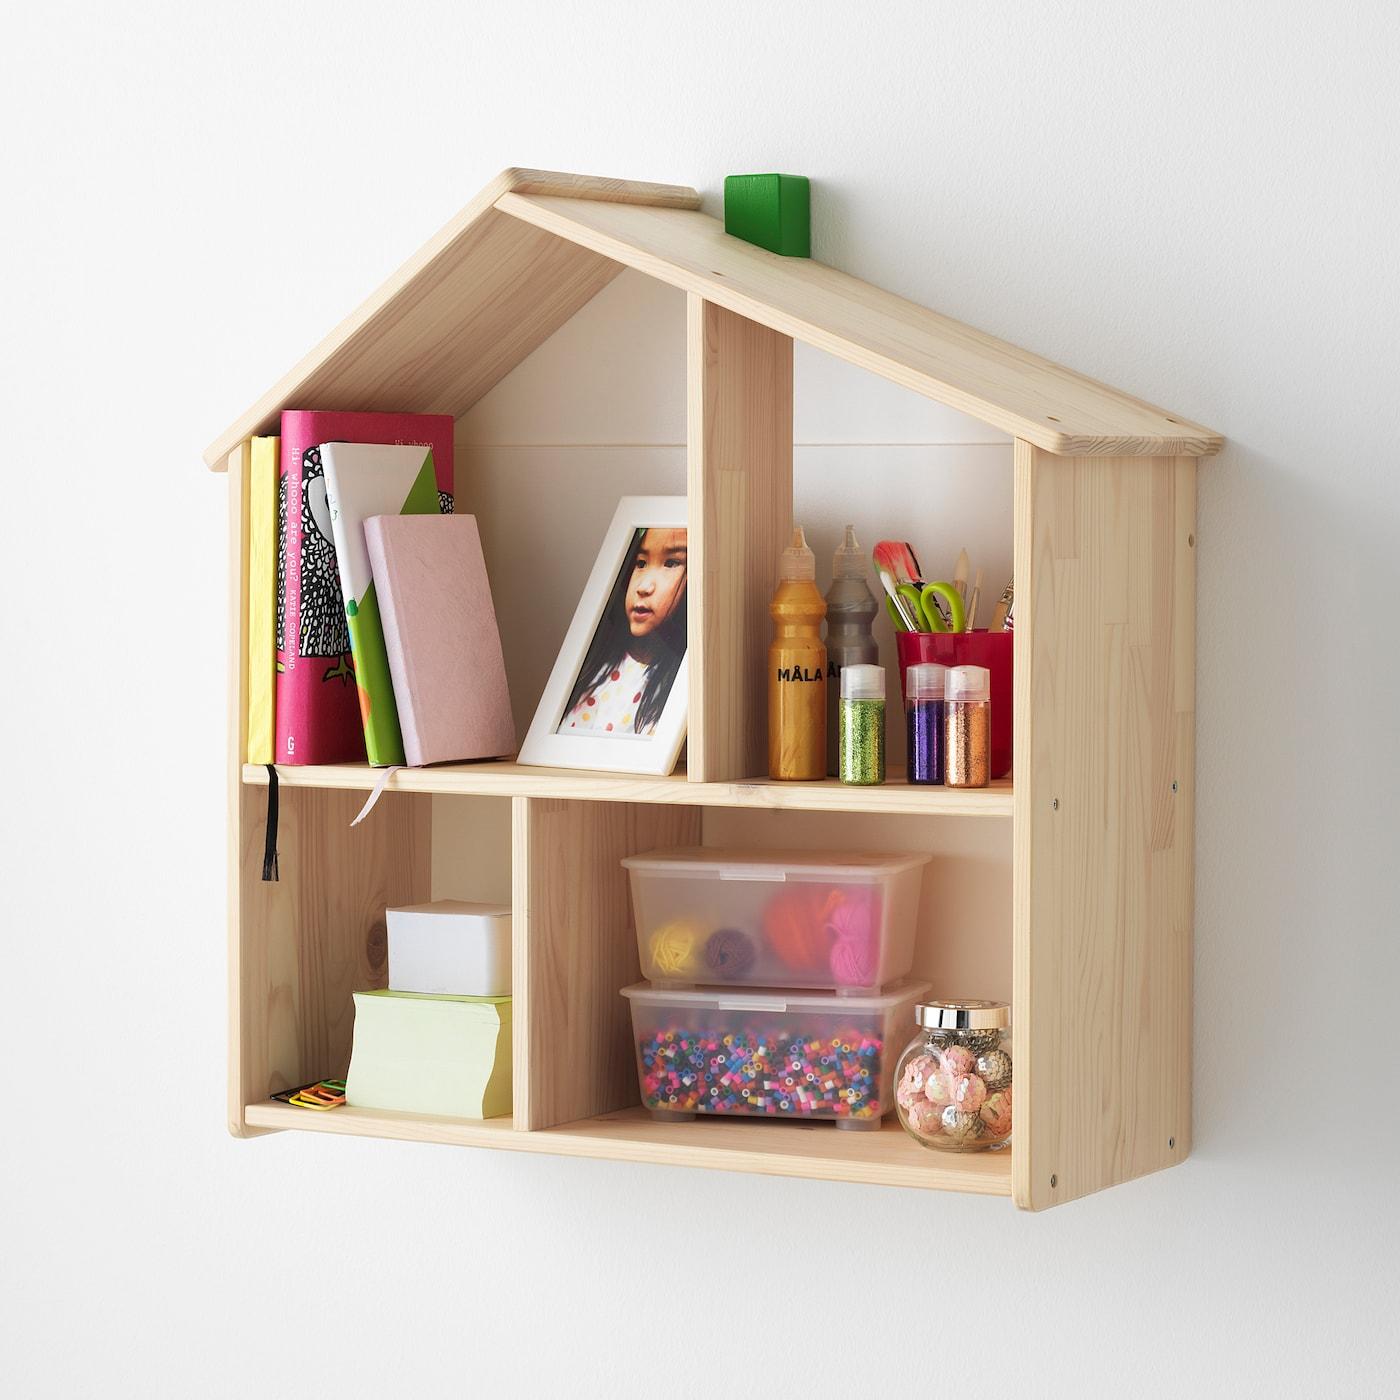 Dollhouse Miniatures Acrylic Bakery and Pastry Shelf